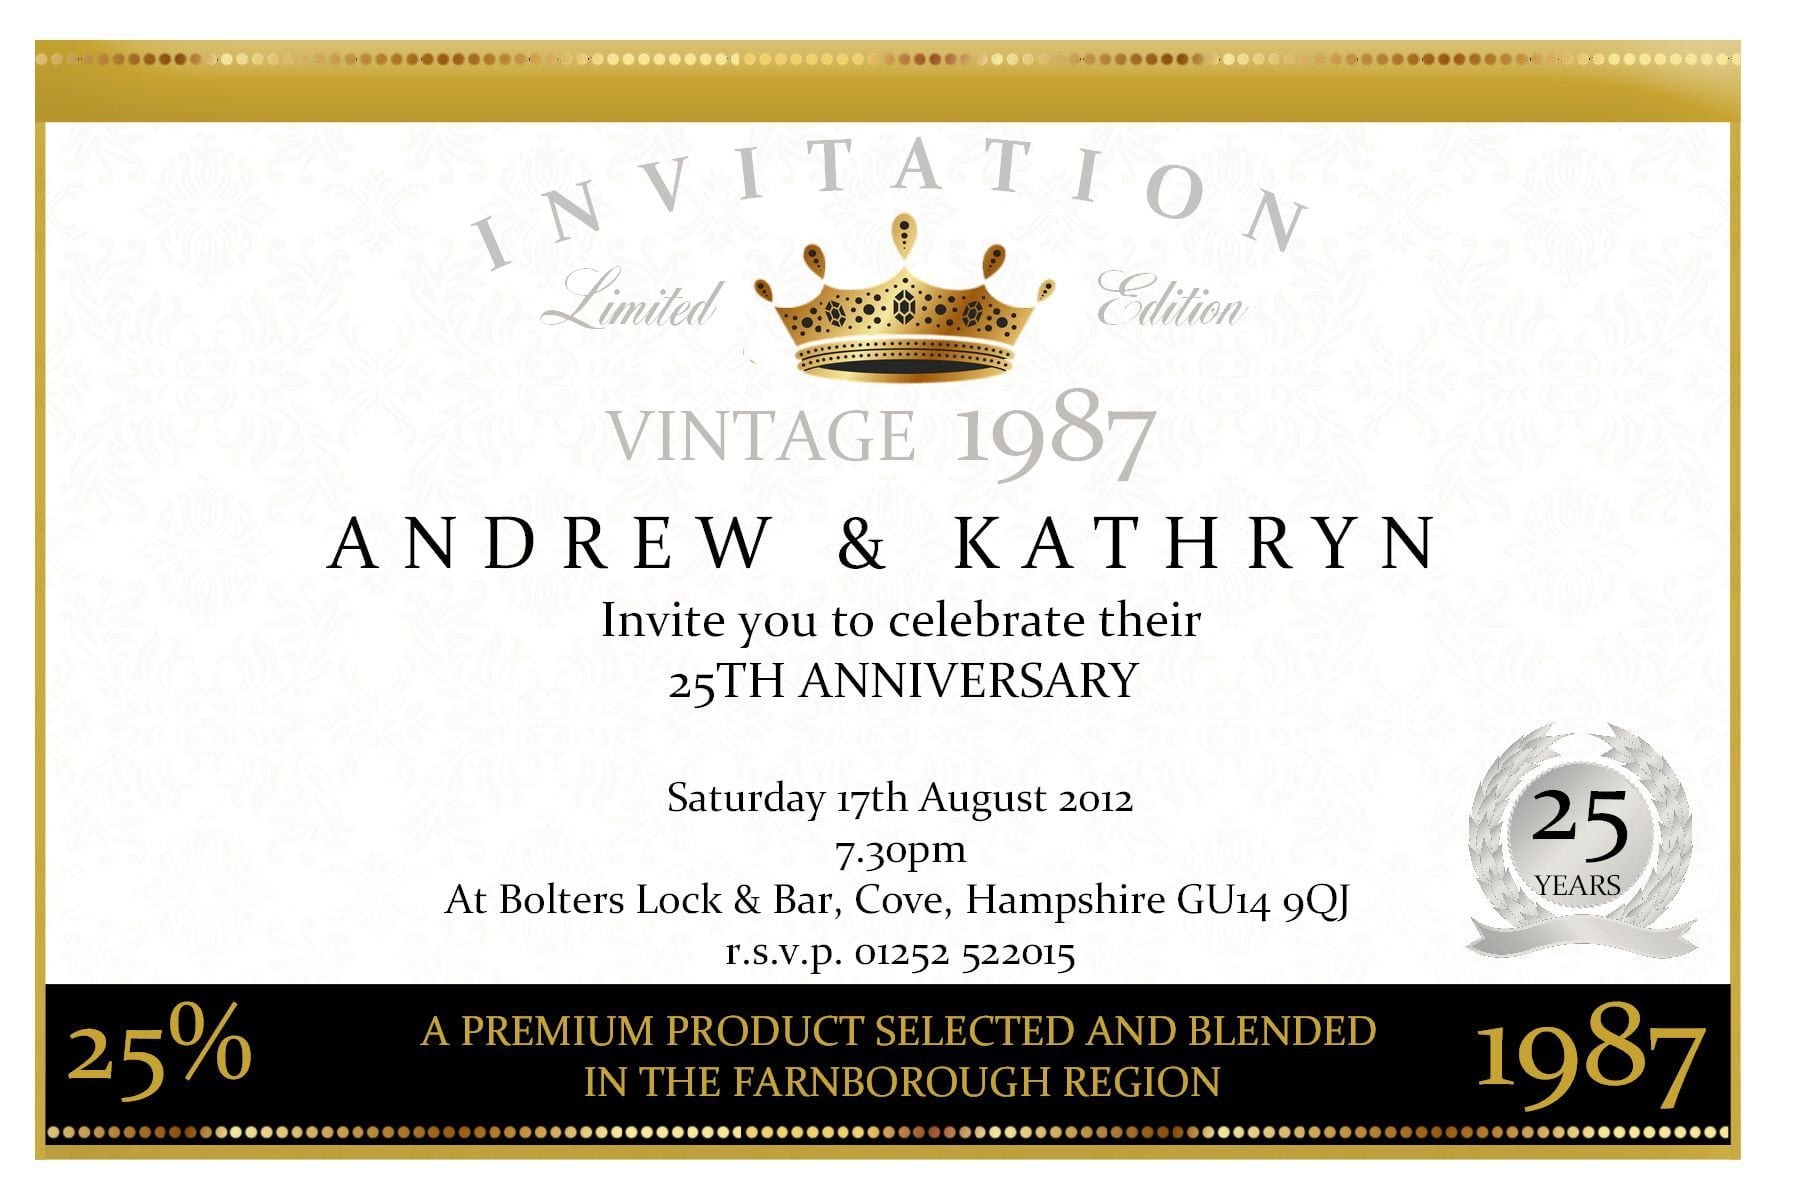 free_wedding_anniversary_invitation_templates-3.jpeg